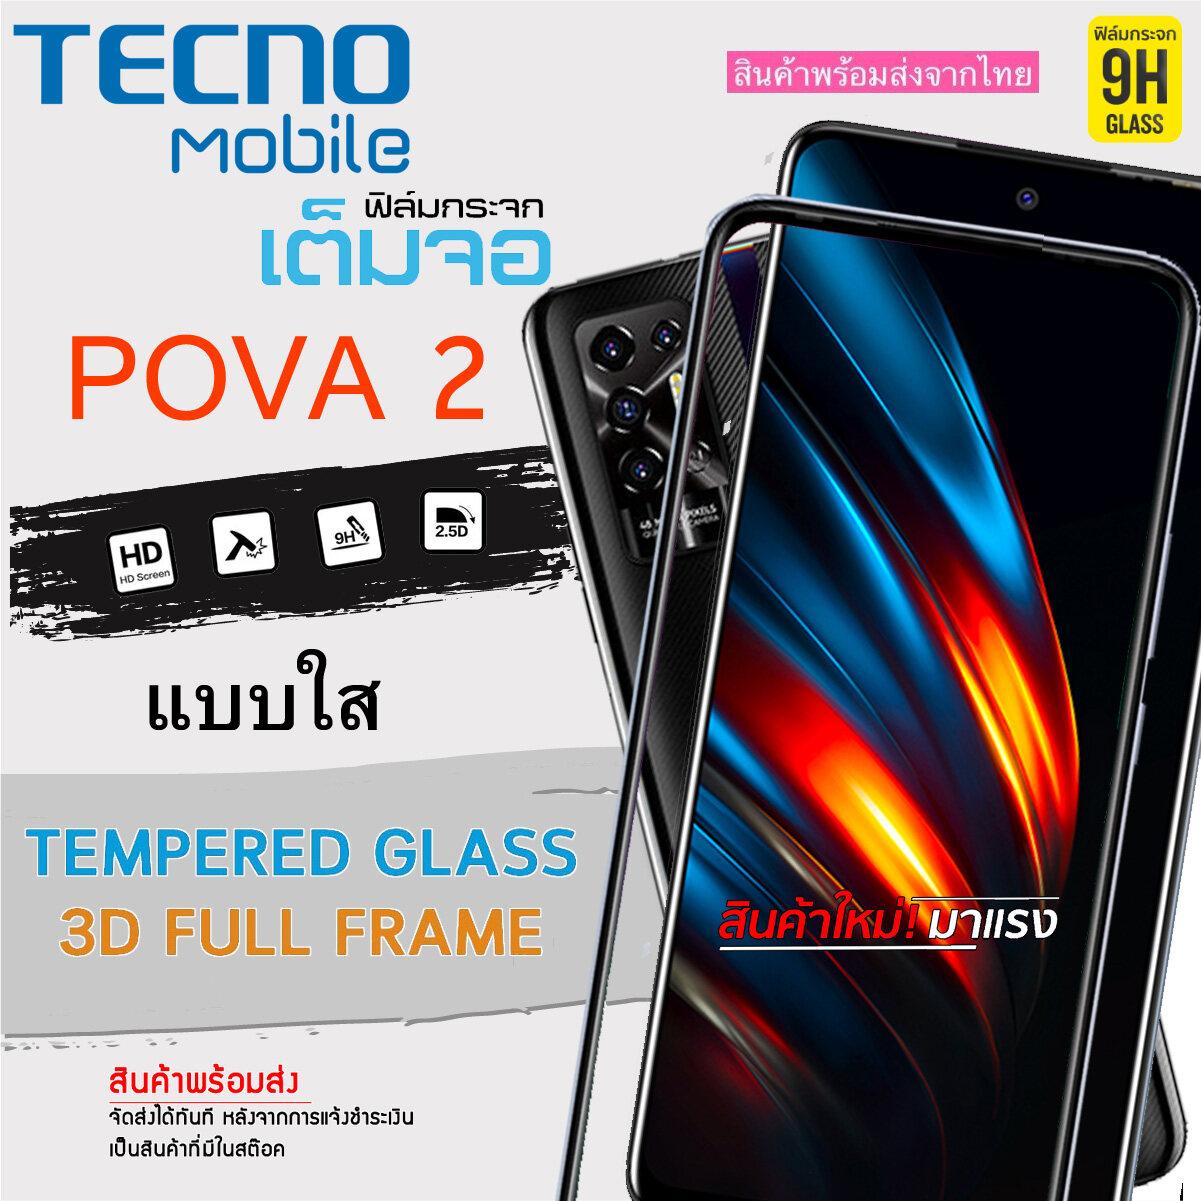 ? I-Fin ?ฟิล์มกระจกนิรภัย เต็มจอ 5d กาวเต็มแผ่น ( แบบใส ) สำหรับ Tecno Pova 2.